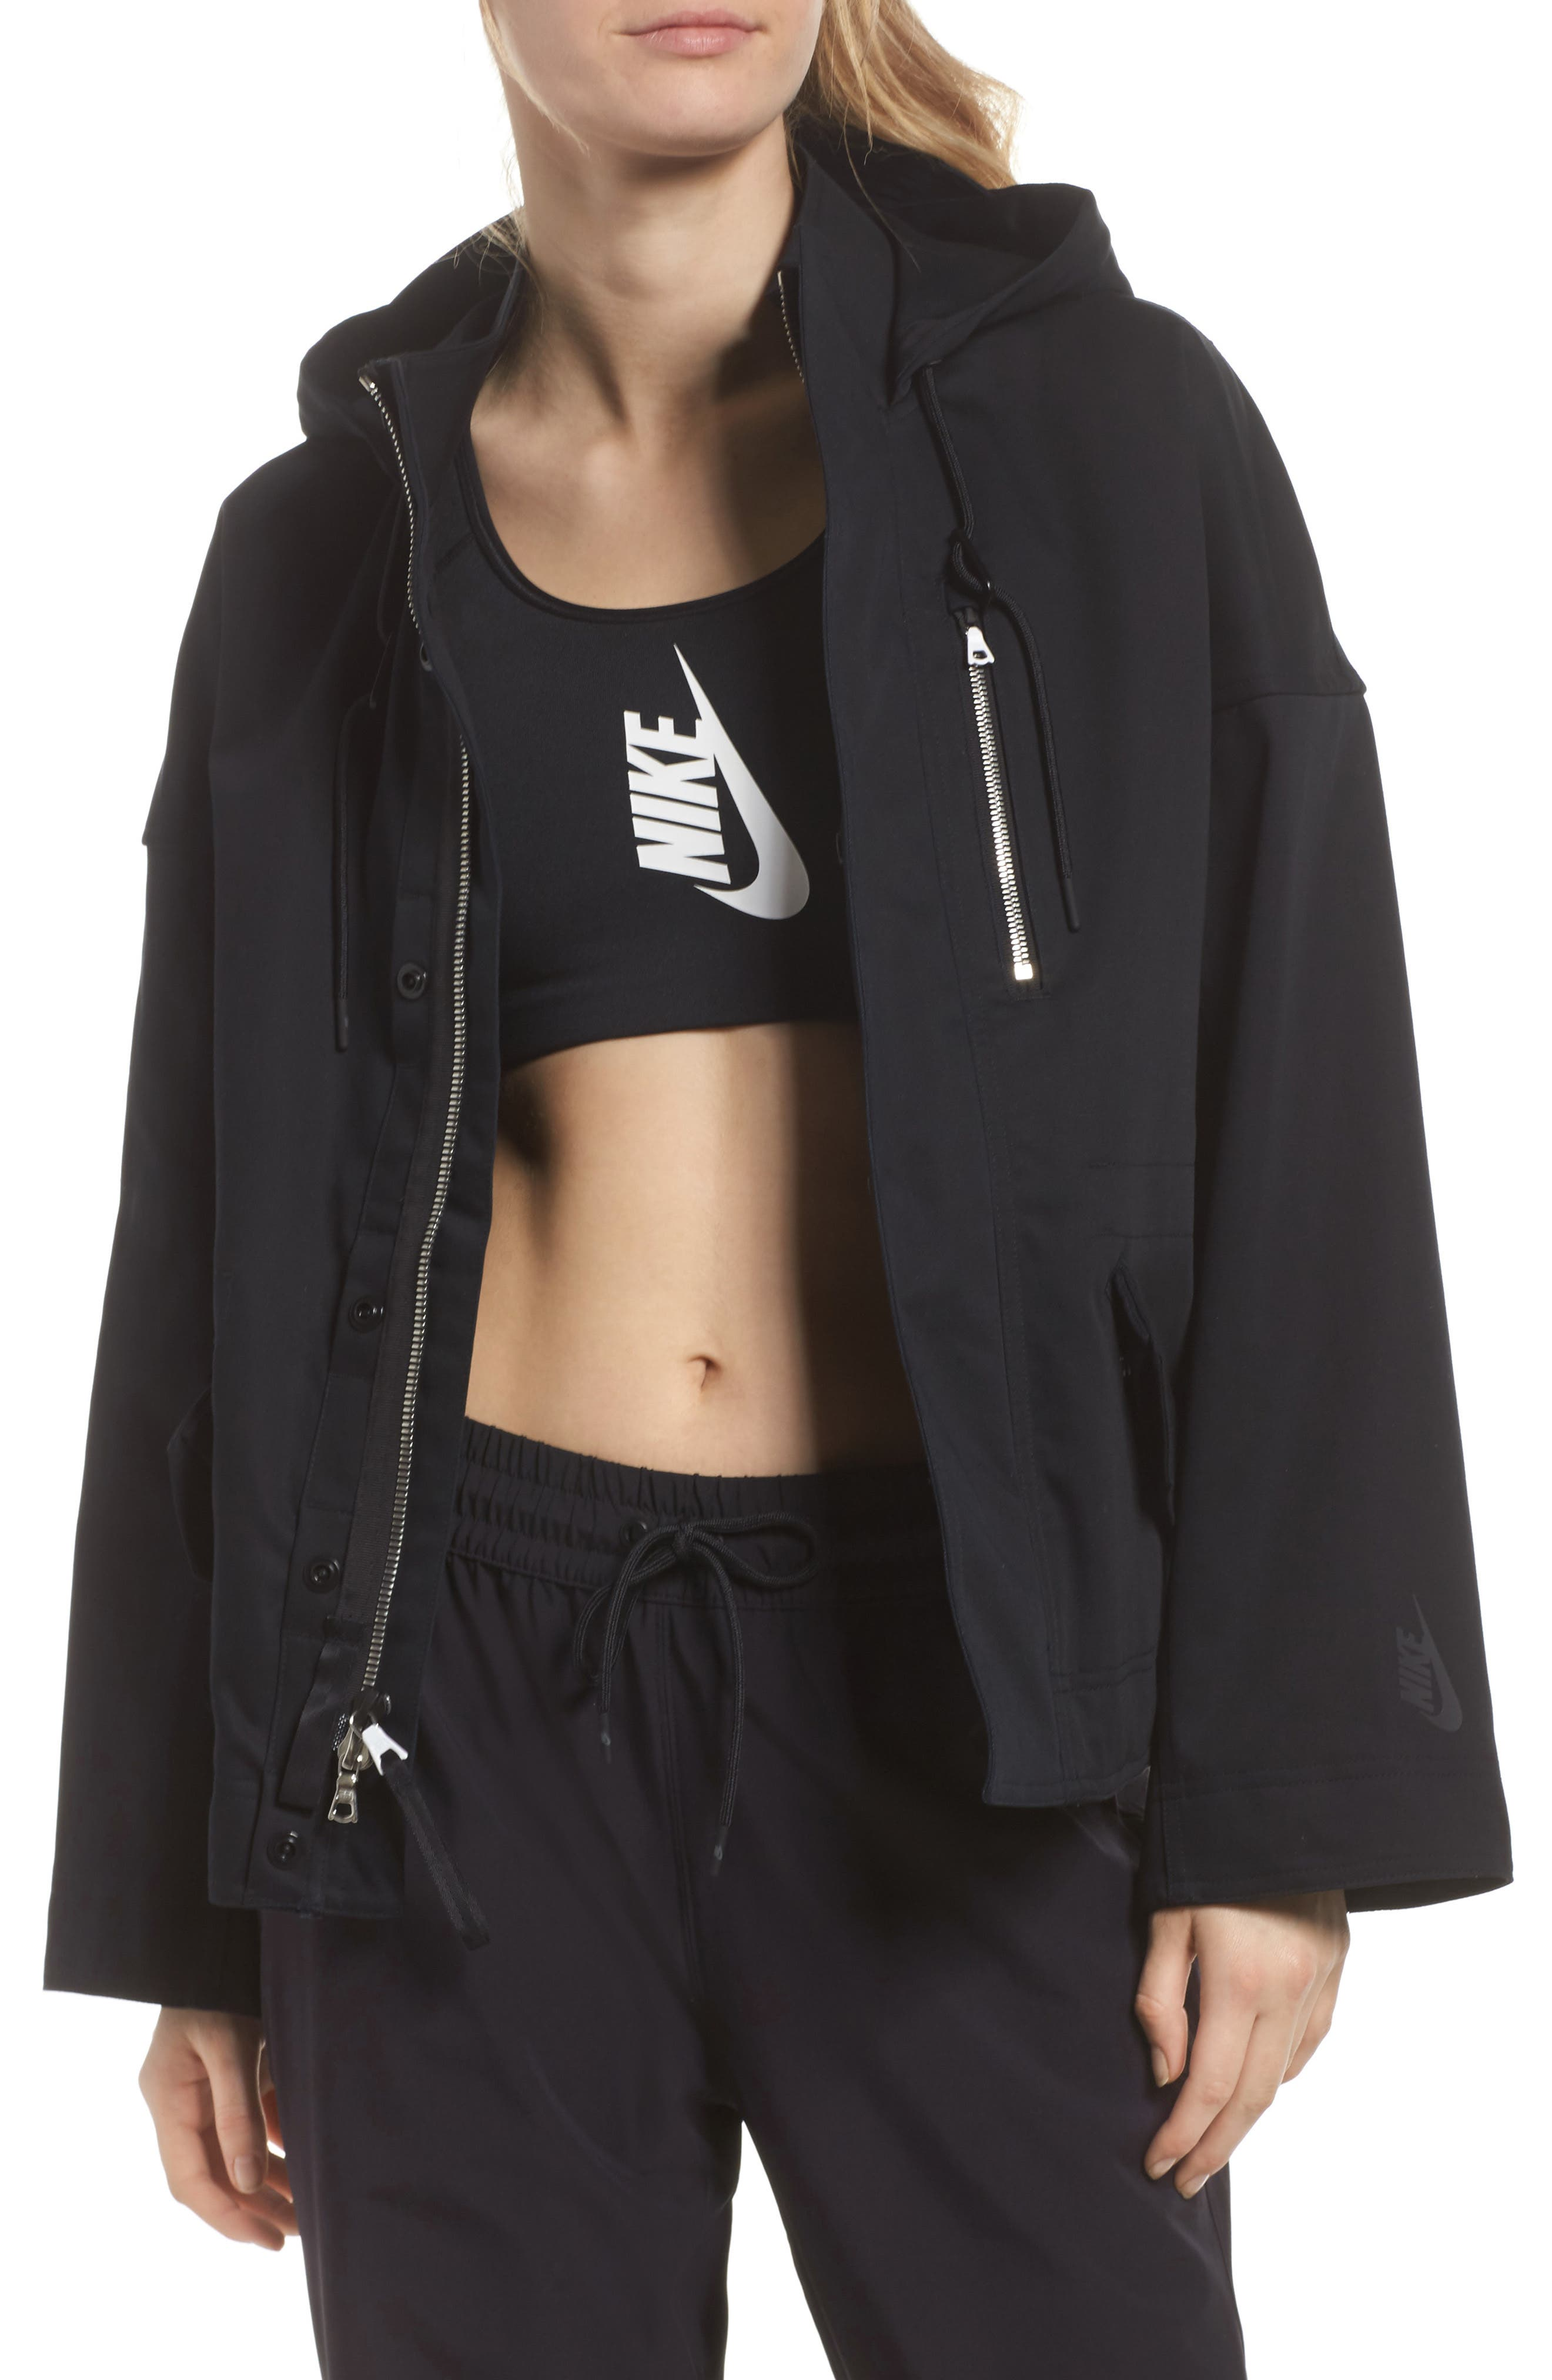 NikeLab Collection Women's Tactical Jacket,                             Main thumbnail 1, color,                             Black/ Black